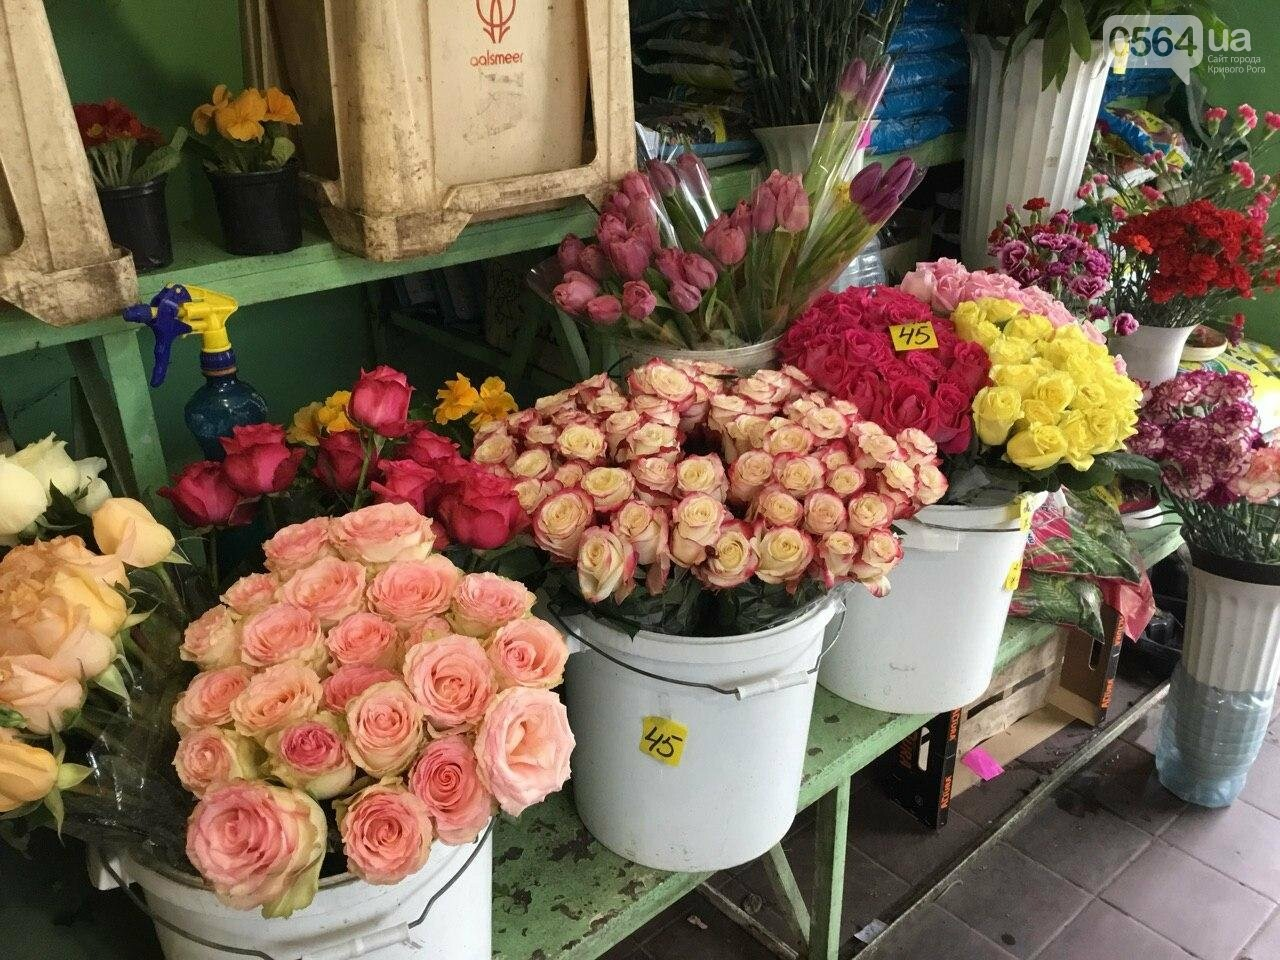 Сколько стоят примула, цикламен, мимоза? Обзор цен на цветы в Кривом Роге, - ФОТО, ВИДЕО, фото-21